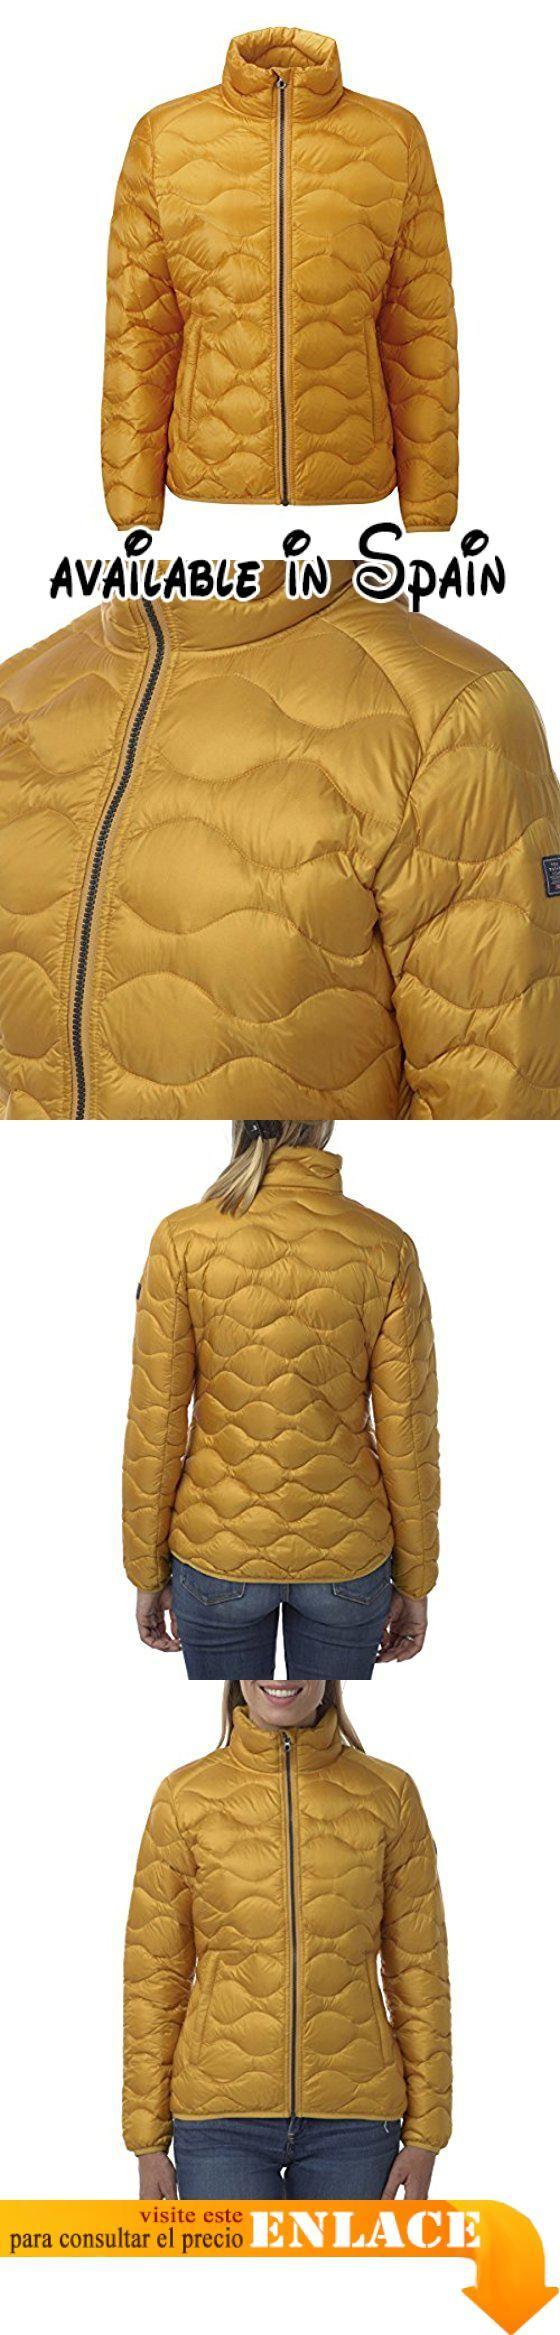 B01LXP1H60 : Tog 24 - Abrigo impermeable - chaqueta - para mujer amarillo amarillo 40.